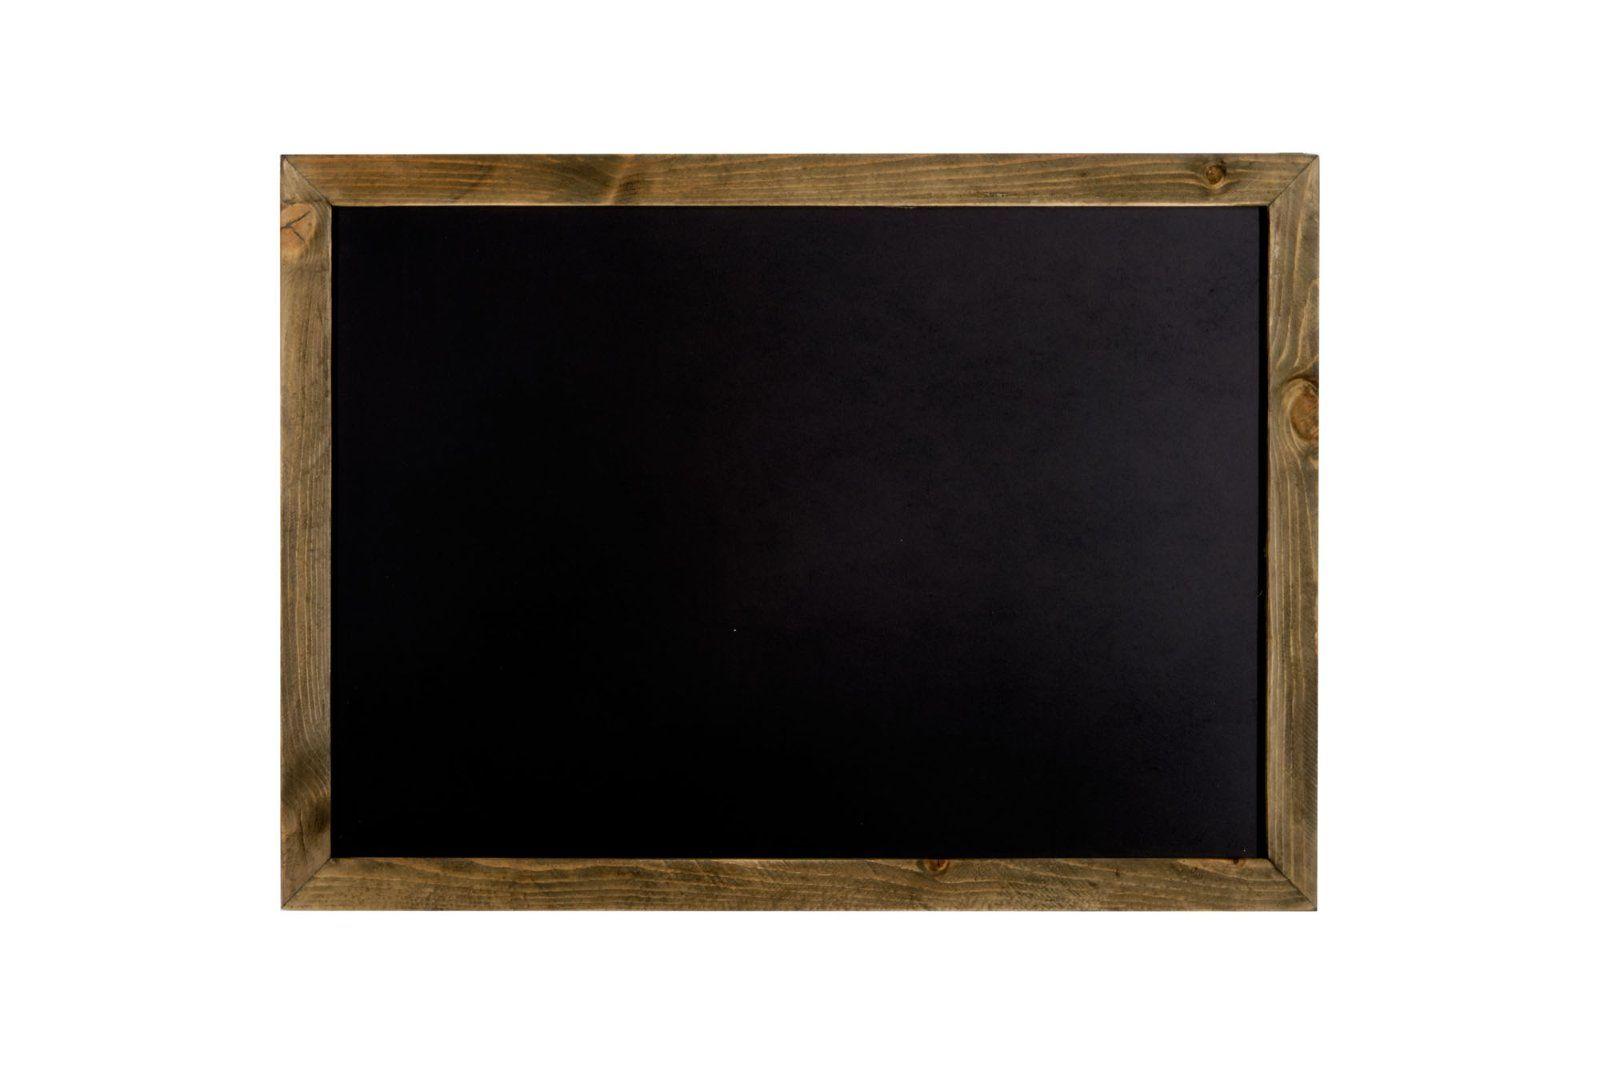 Wooden Edge Blackboard 71 x 50 x 1 cm